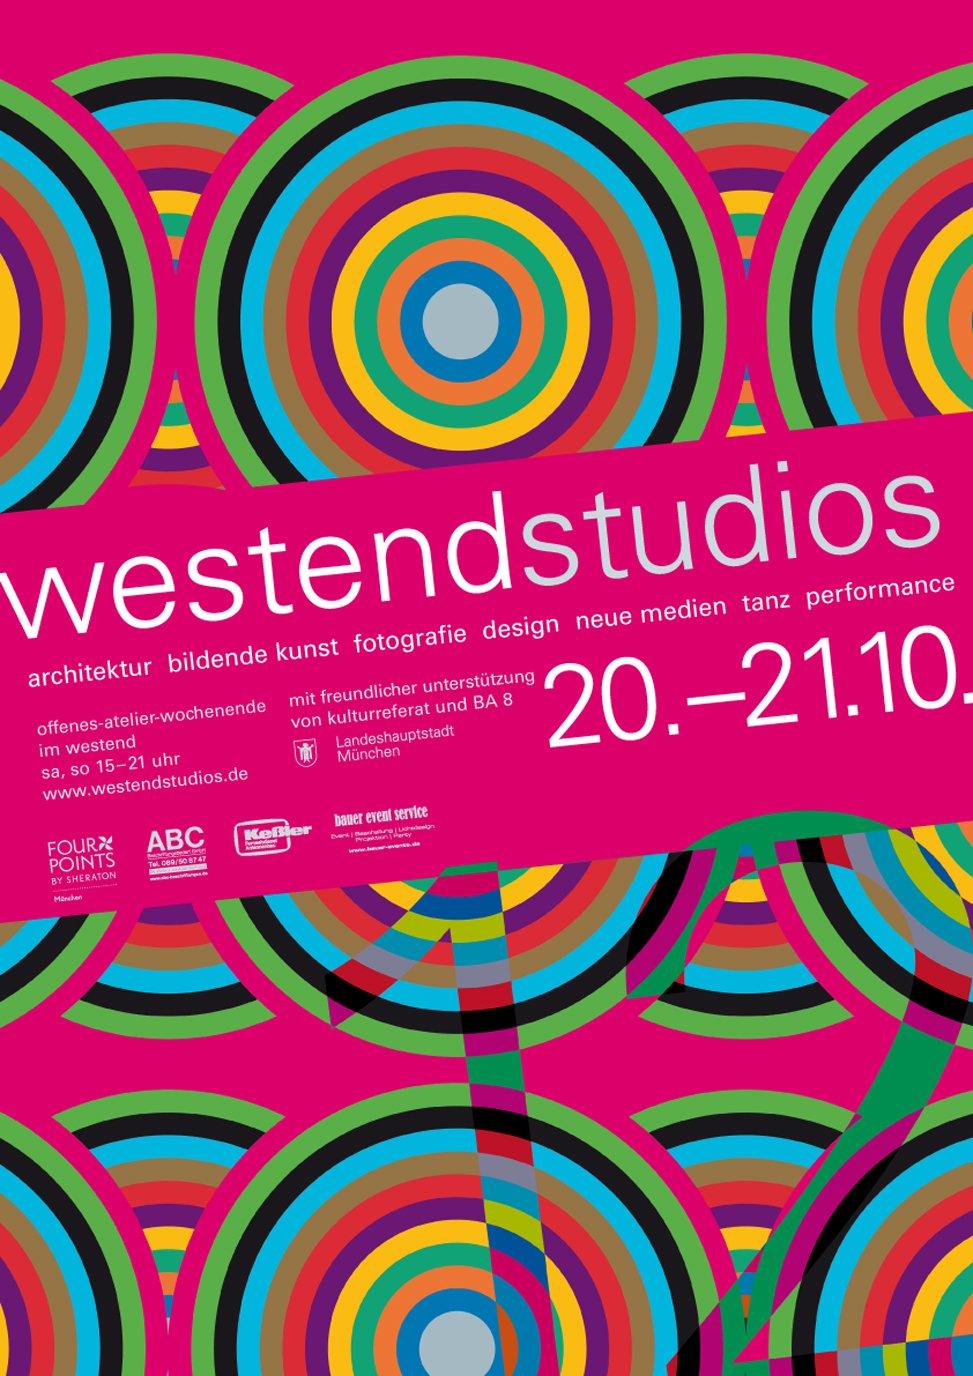 westendstudios 12_plakat_DIN A3_RZ_190912.indd